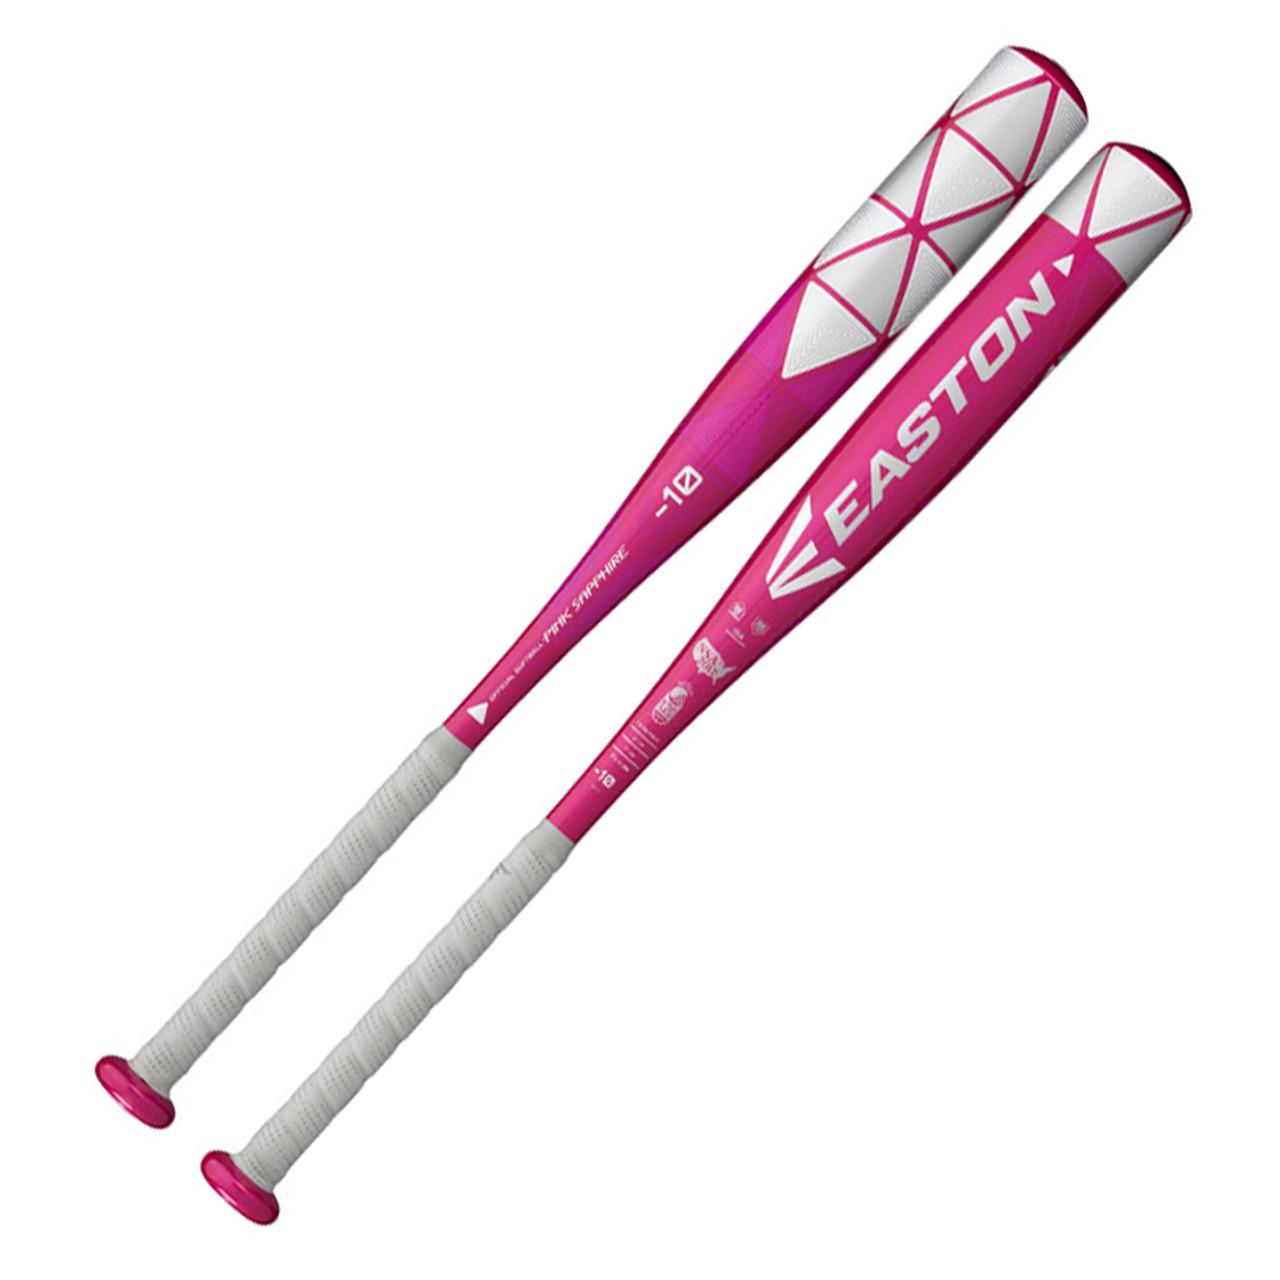 2018 Easton Pink Sapphire Fastpitch Softball Bat